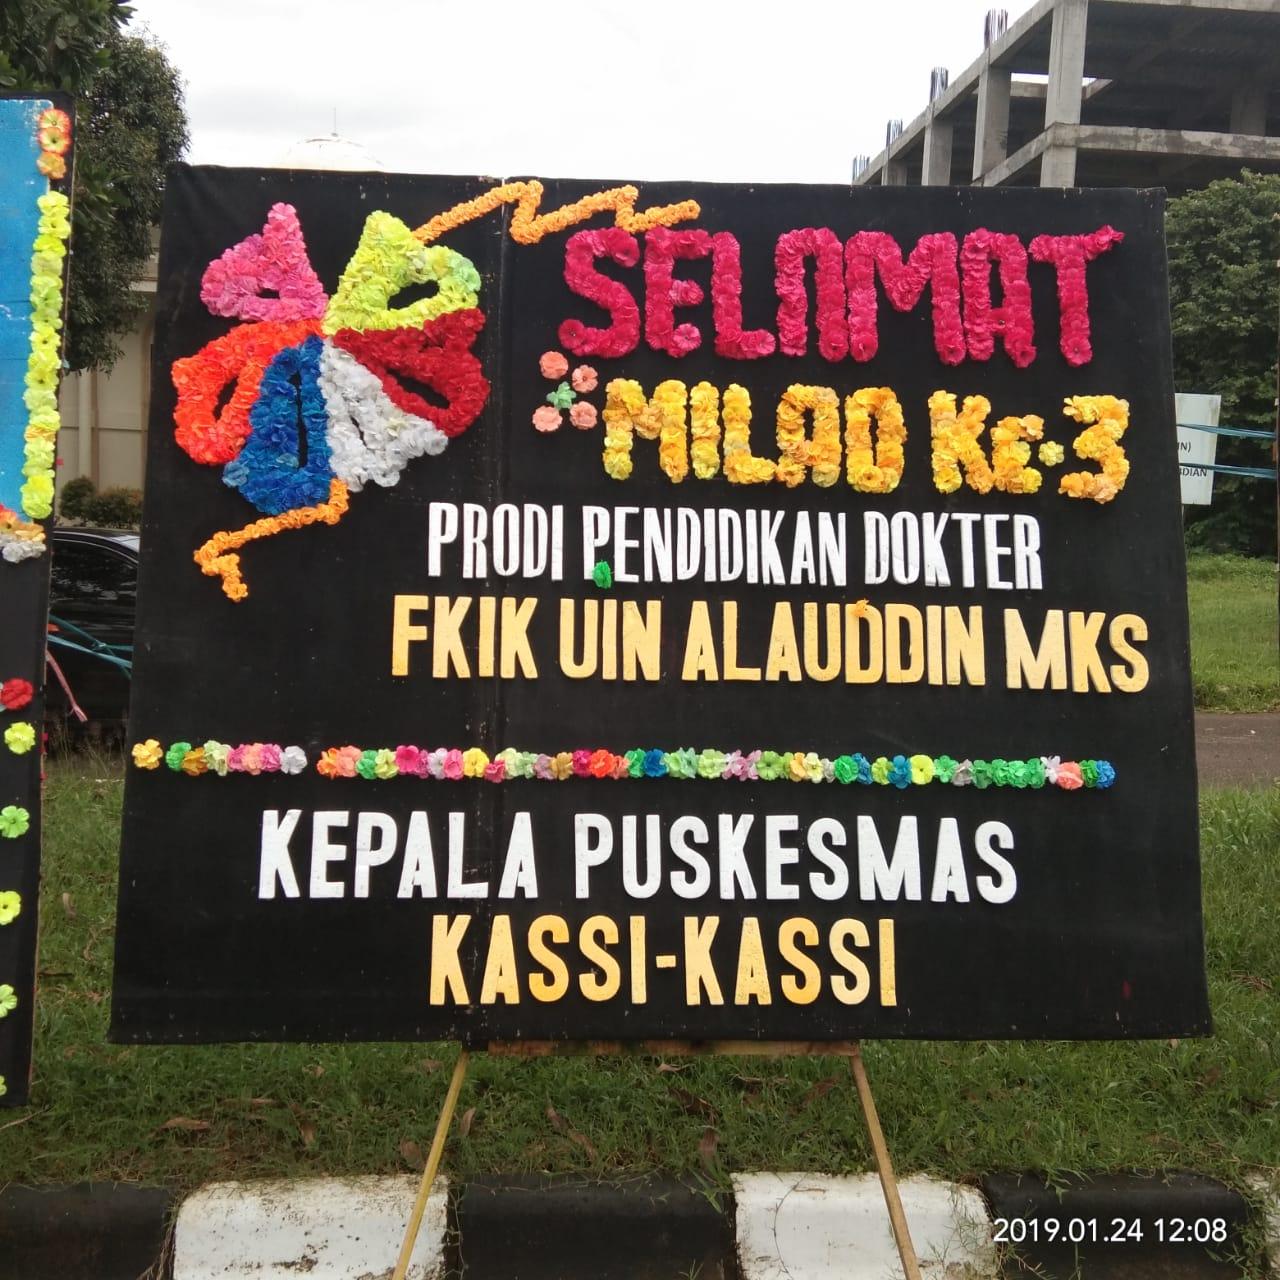 Ucapan Selamat Milad Ke 3 PSPD oleh Kepala PKM Kassi-kassi